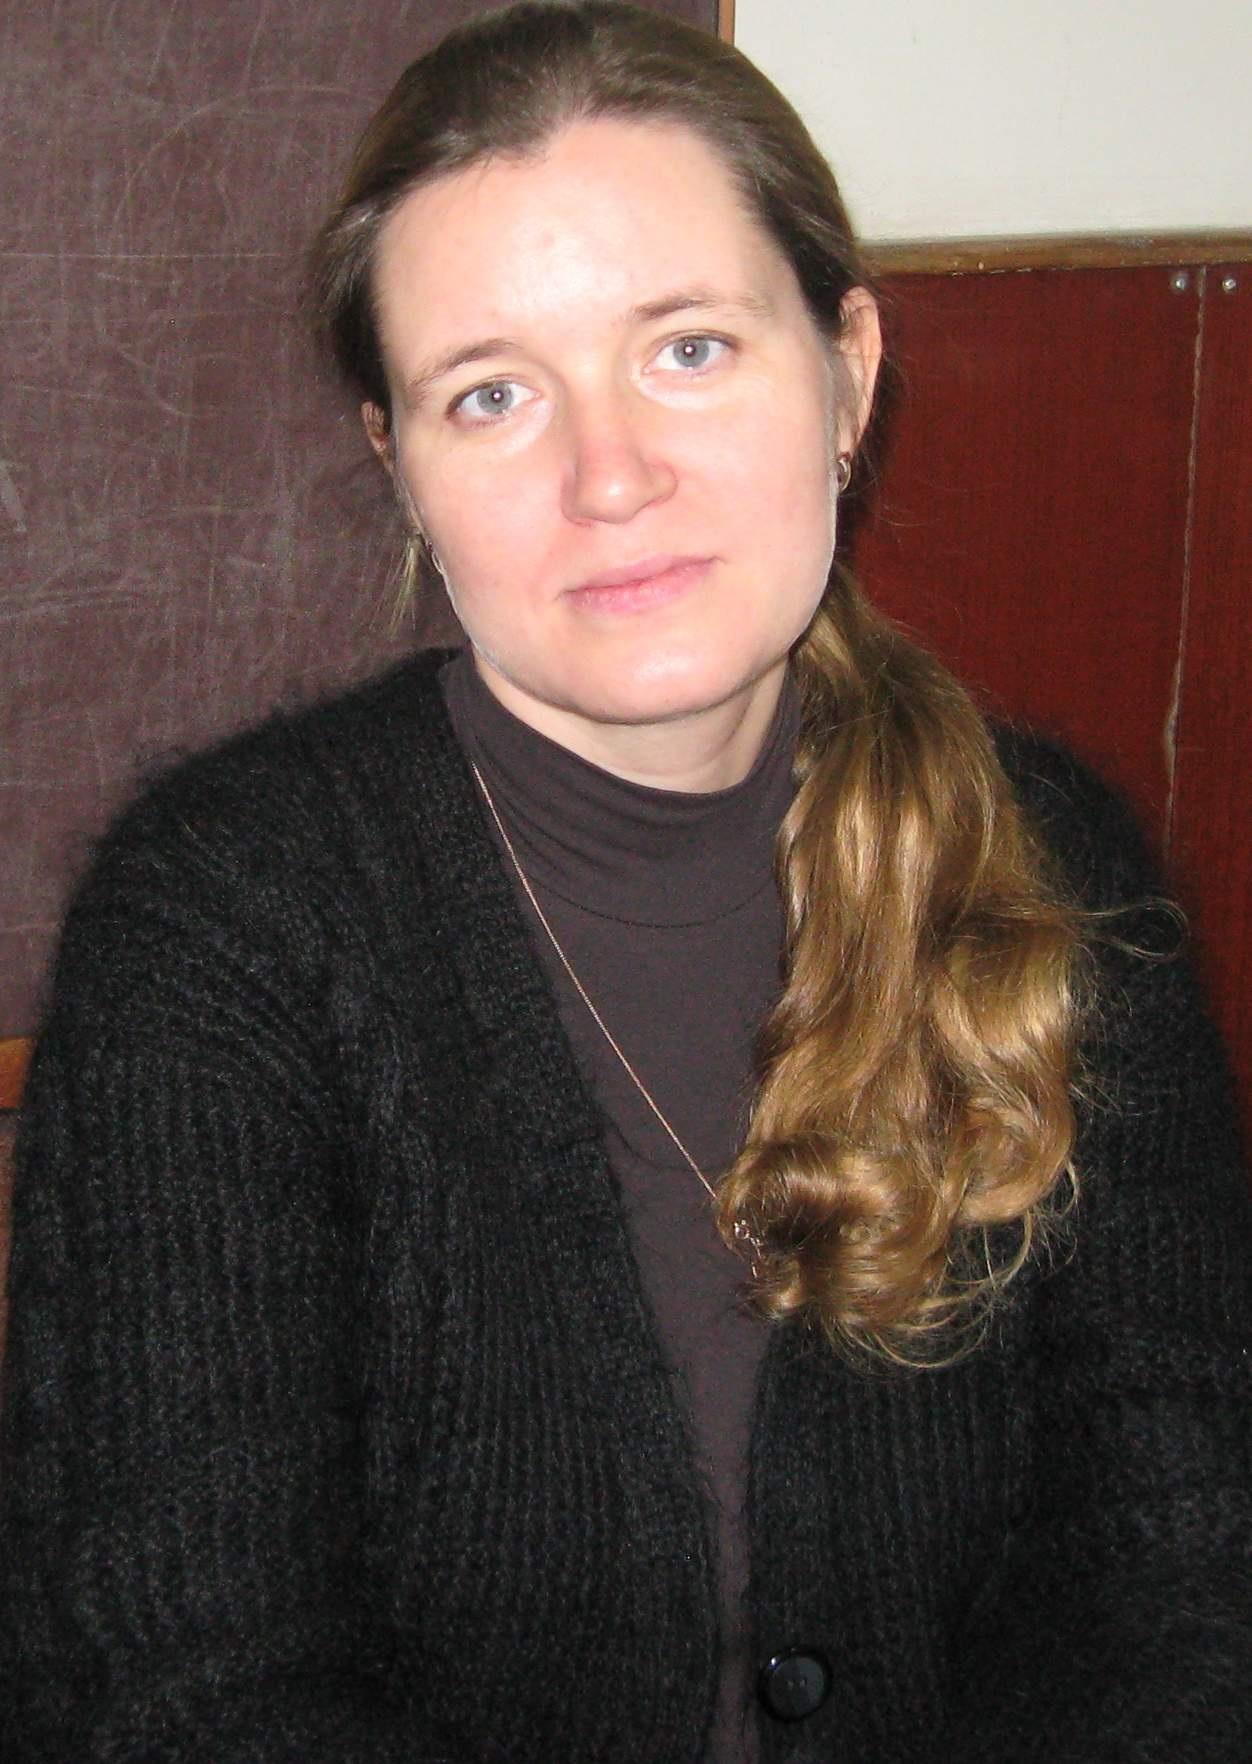 Науменко Тетяна Станіславівна